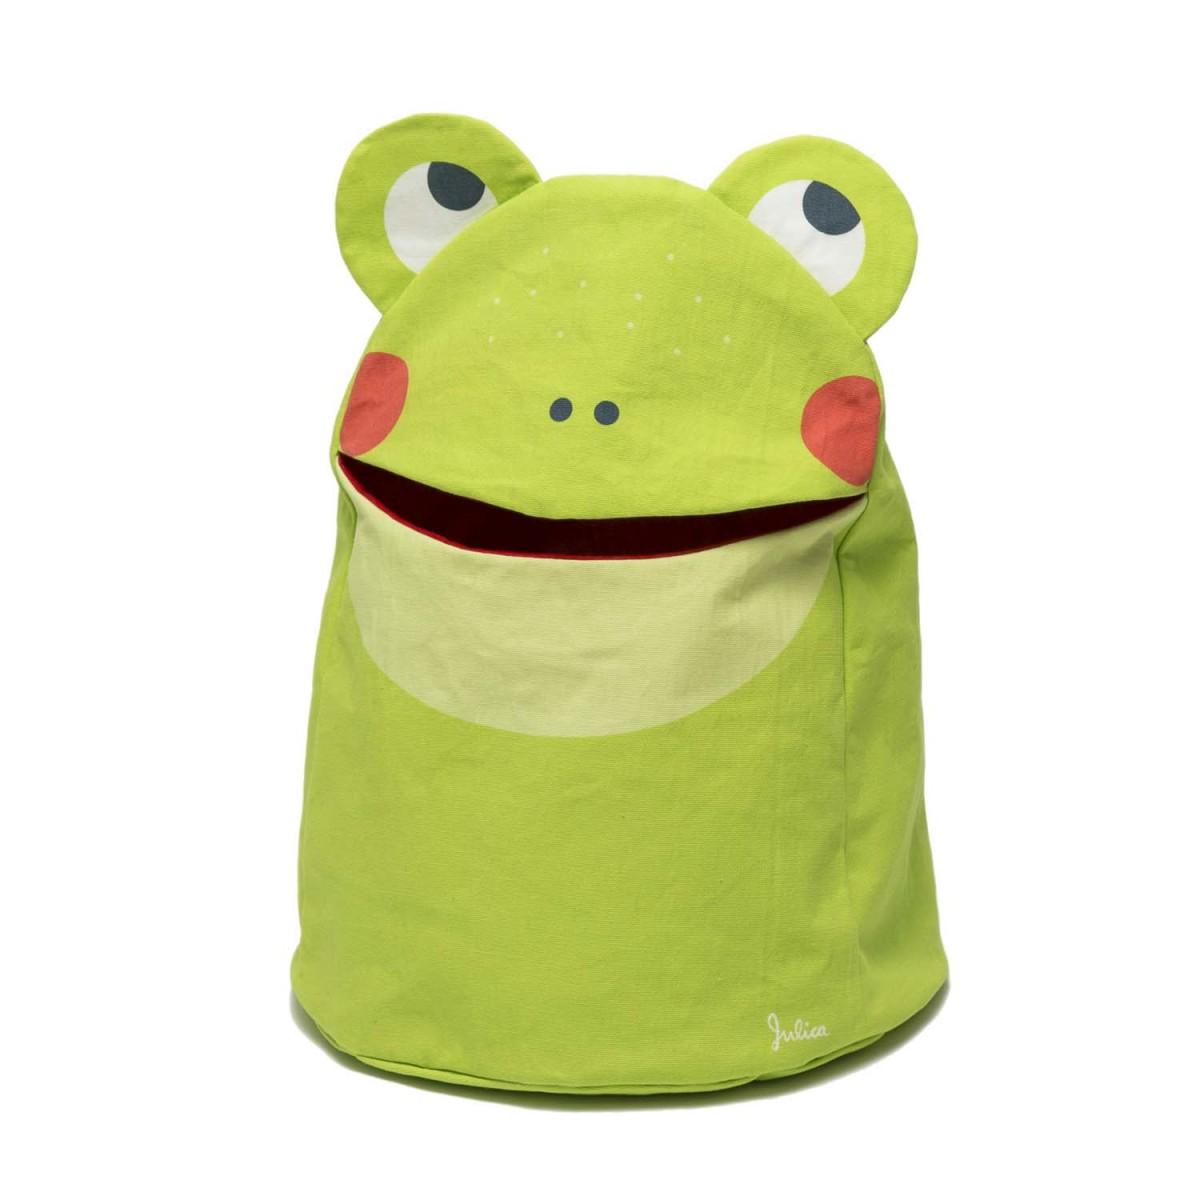 zookids Spielzeugtasche Frosch